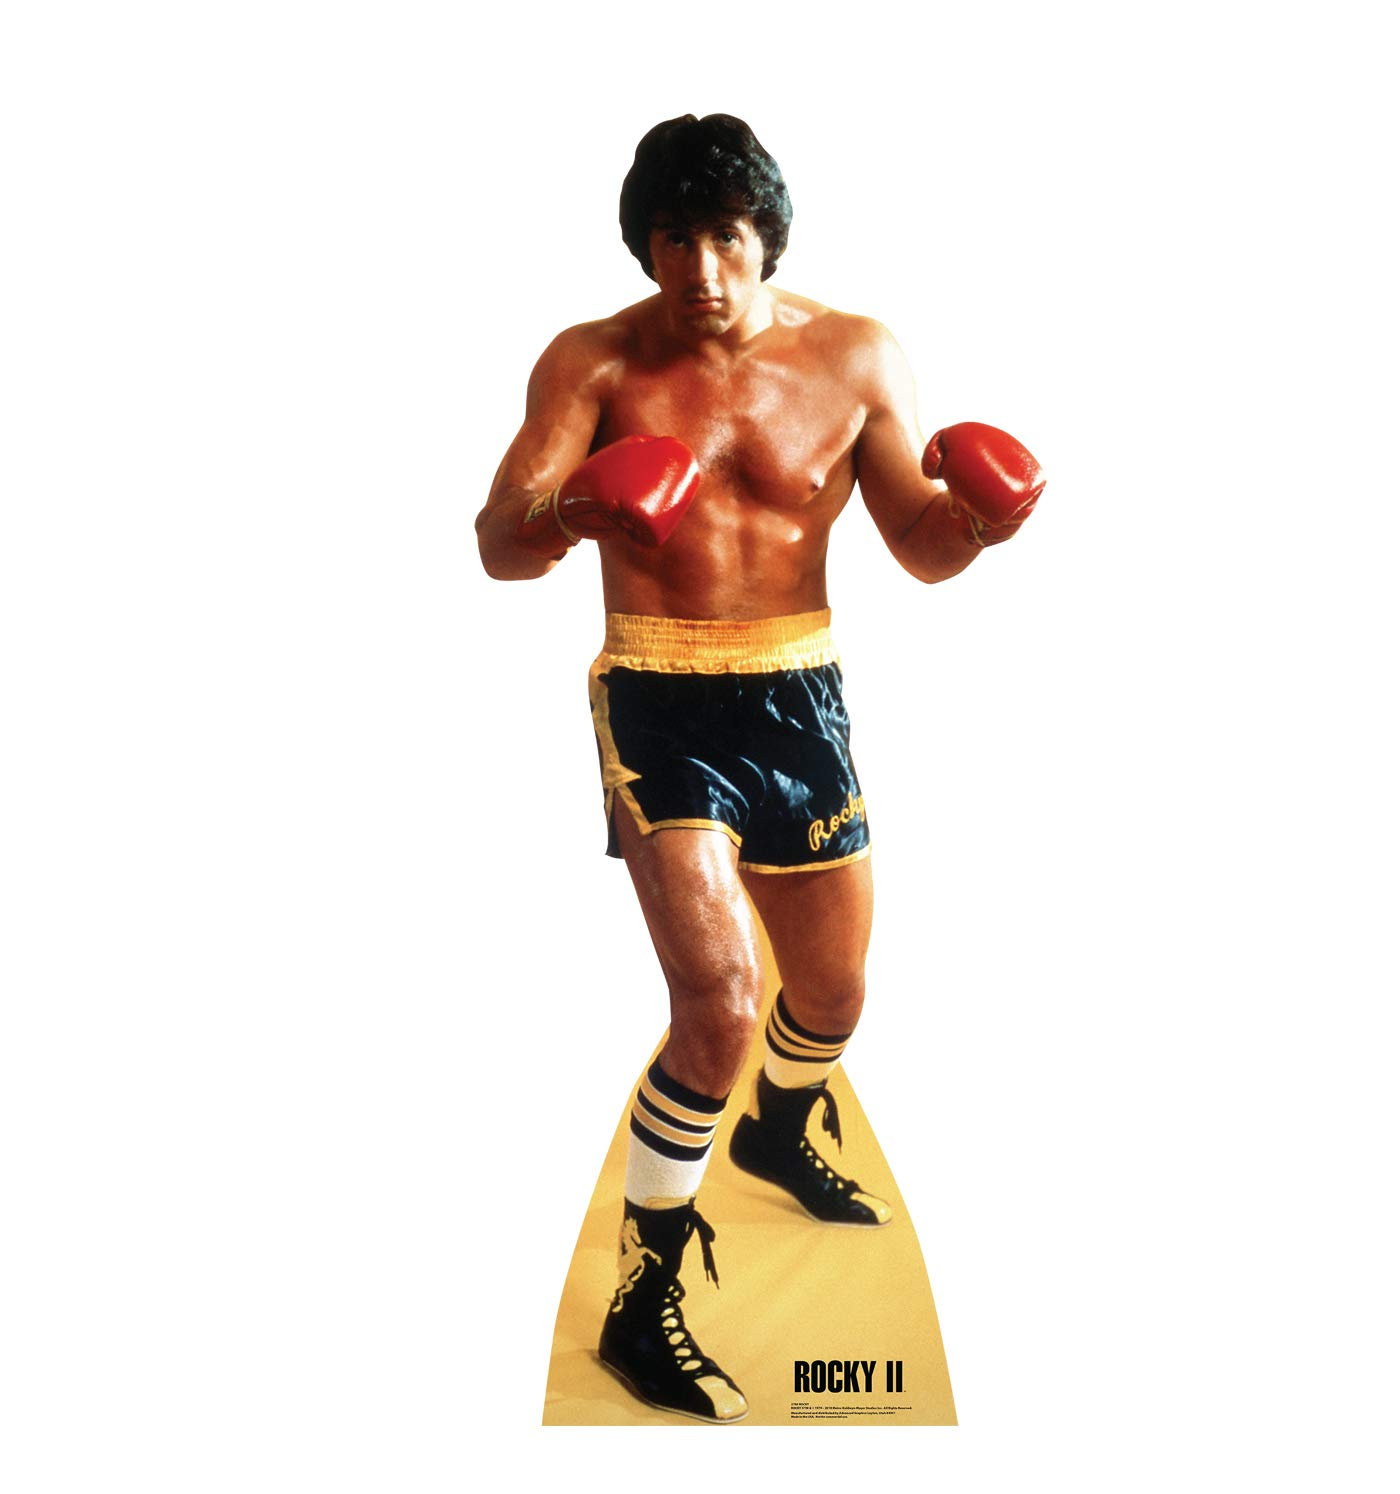 Advanced Graphics Rocky Life Size Cardboard Cutout Standup - Rocky II (1979 Film)